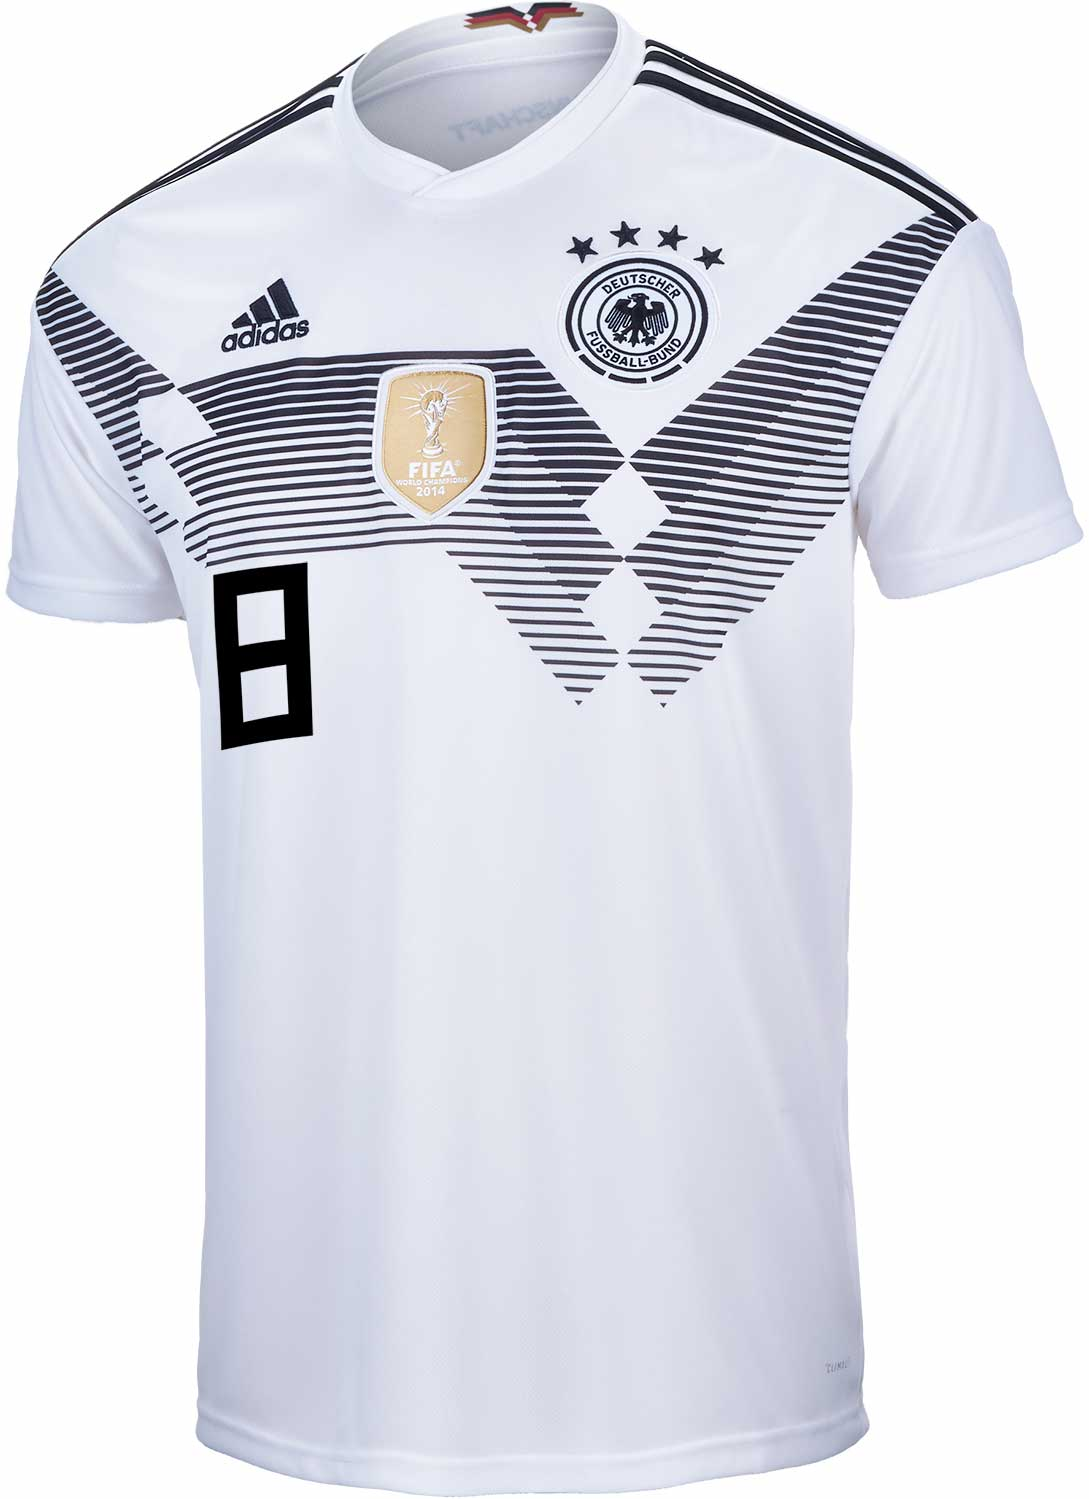 huge discount 8f8c8 2c892 adidas Toni Kroos Germany Home Jersey 2018-19 - SoccerPro